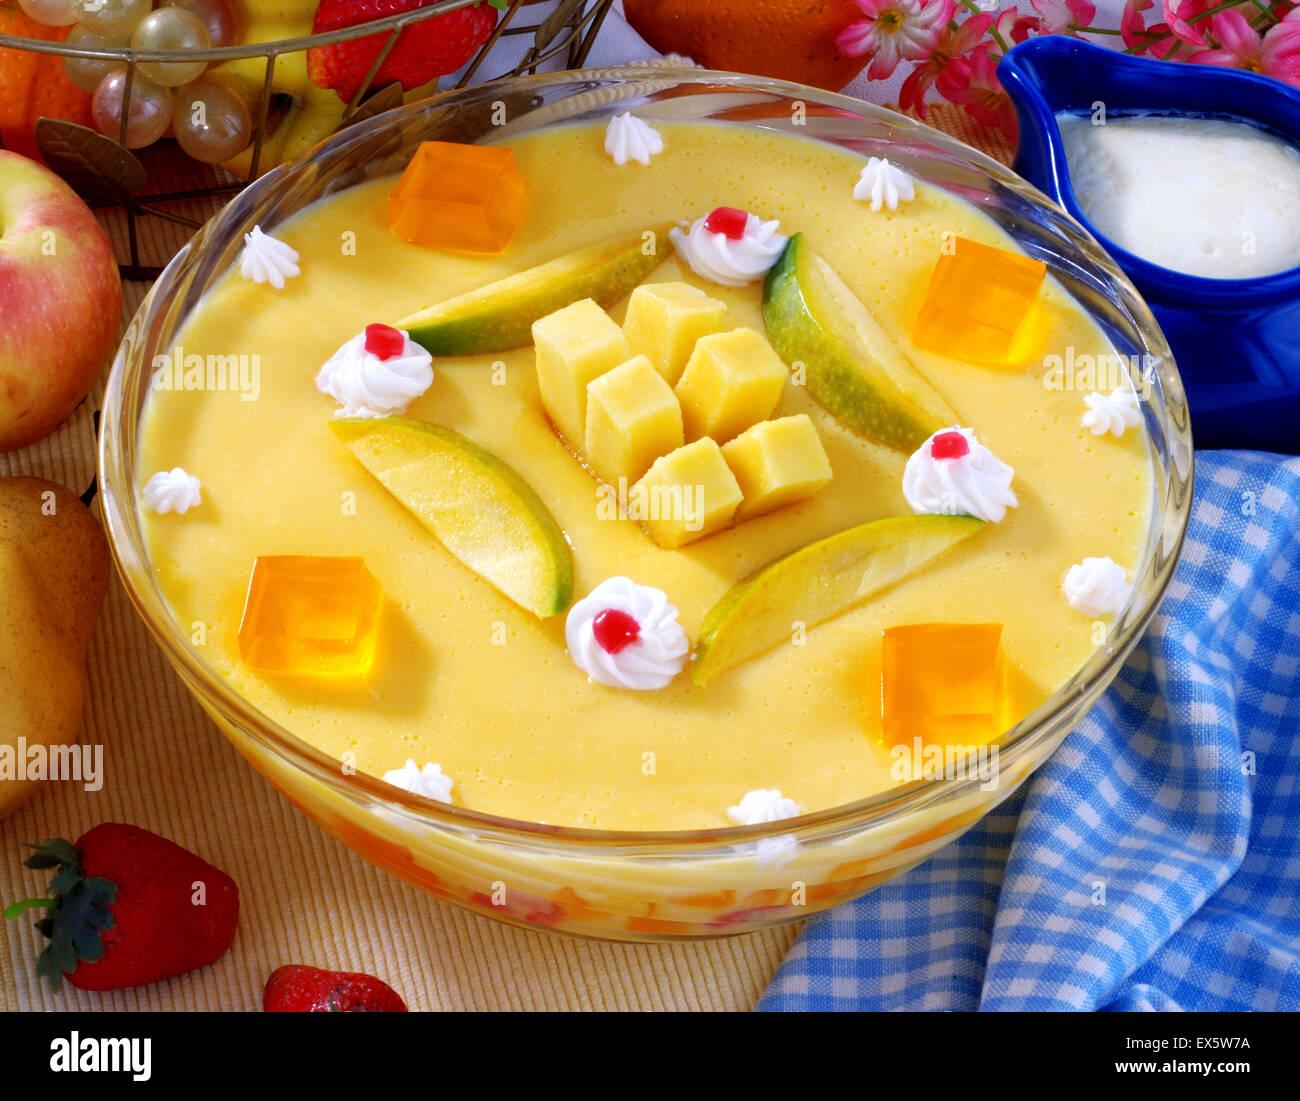 Delicious Mango Custard - Stock Image